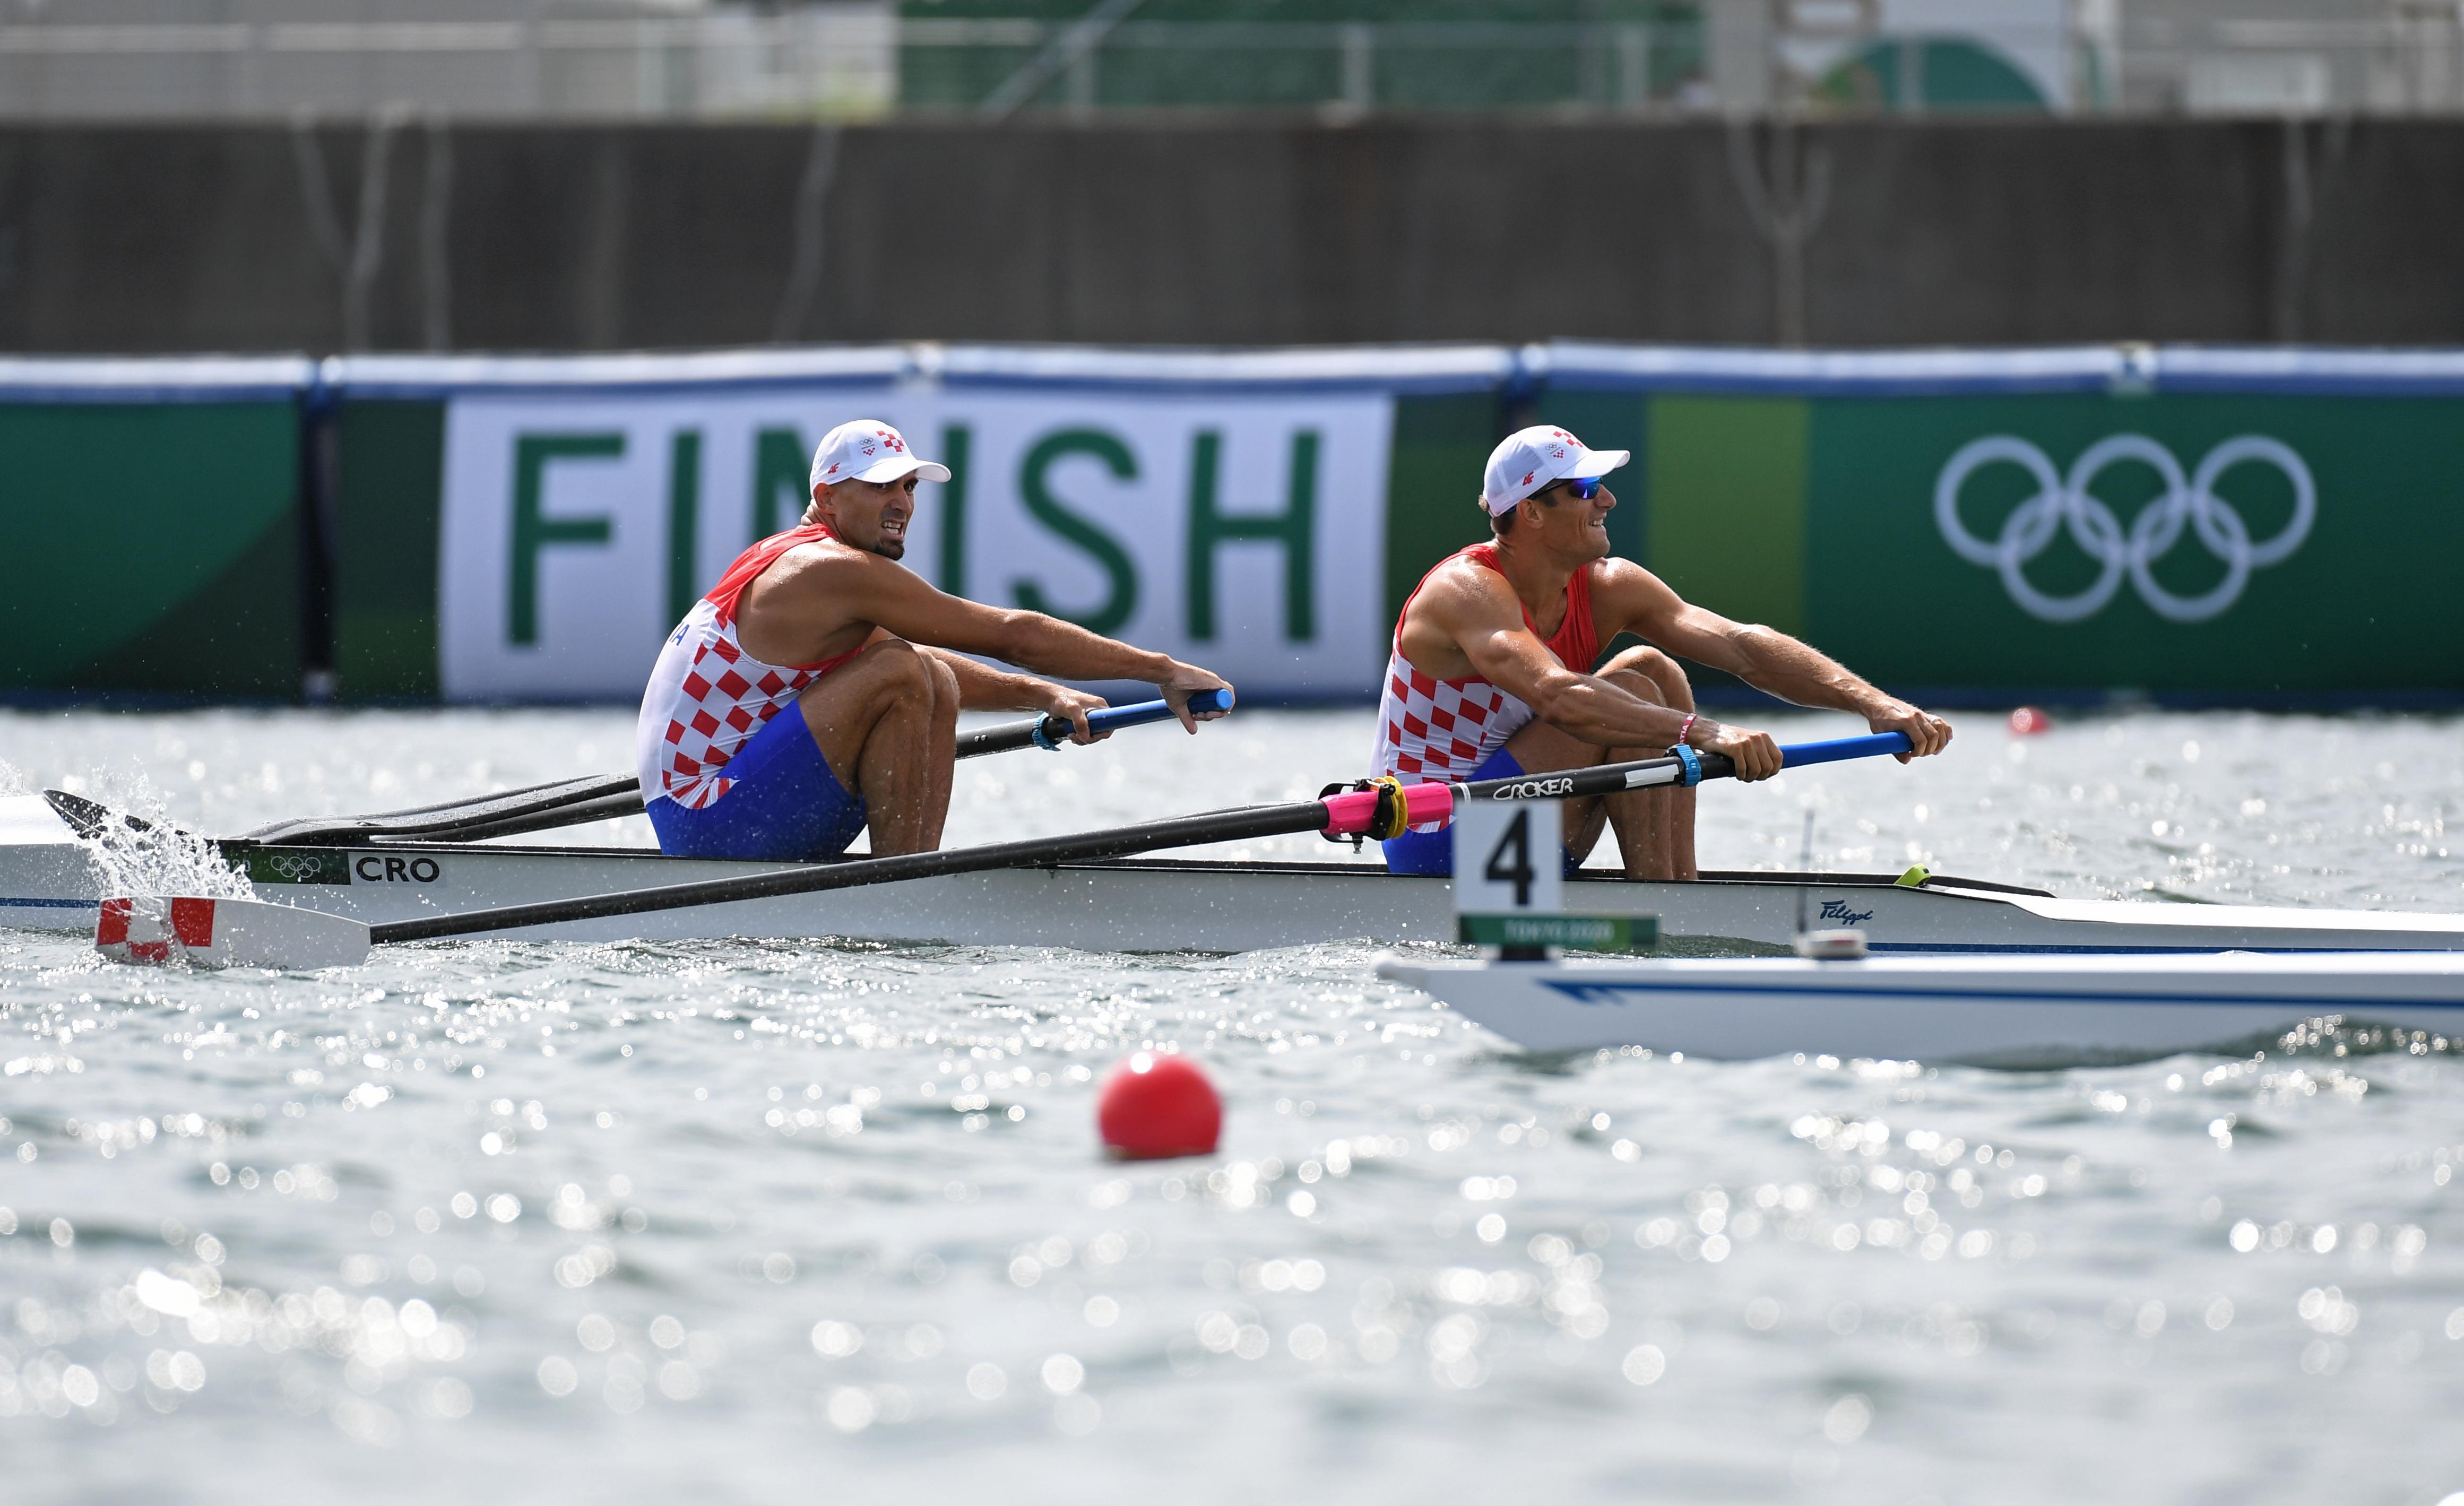 Tokyo 2020 Olympics - Rowing - Men's Pair - Final A - Sea Forest Waterway, Tokyo, Japan - July 29, 2021. Martin Sinkovic of Croatia and Valent Sinkovic of Croatia in action REUTERS/Piroschka Van De Wouw